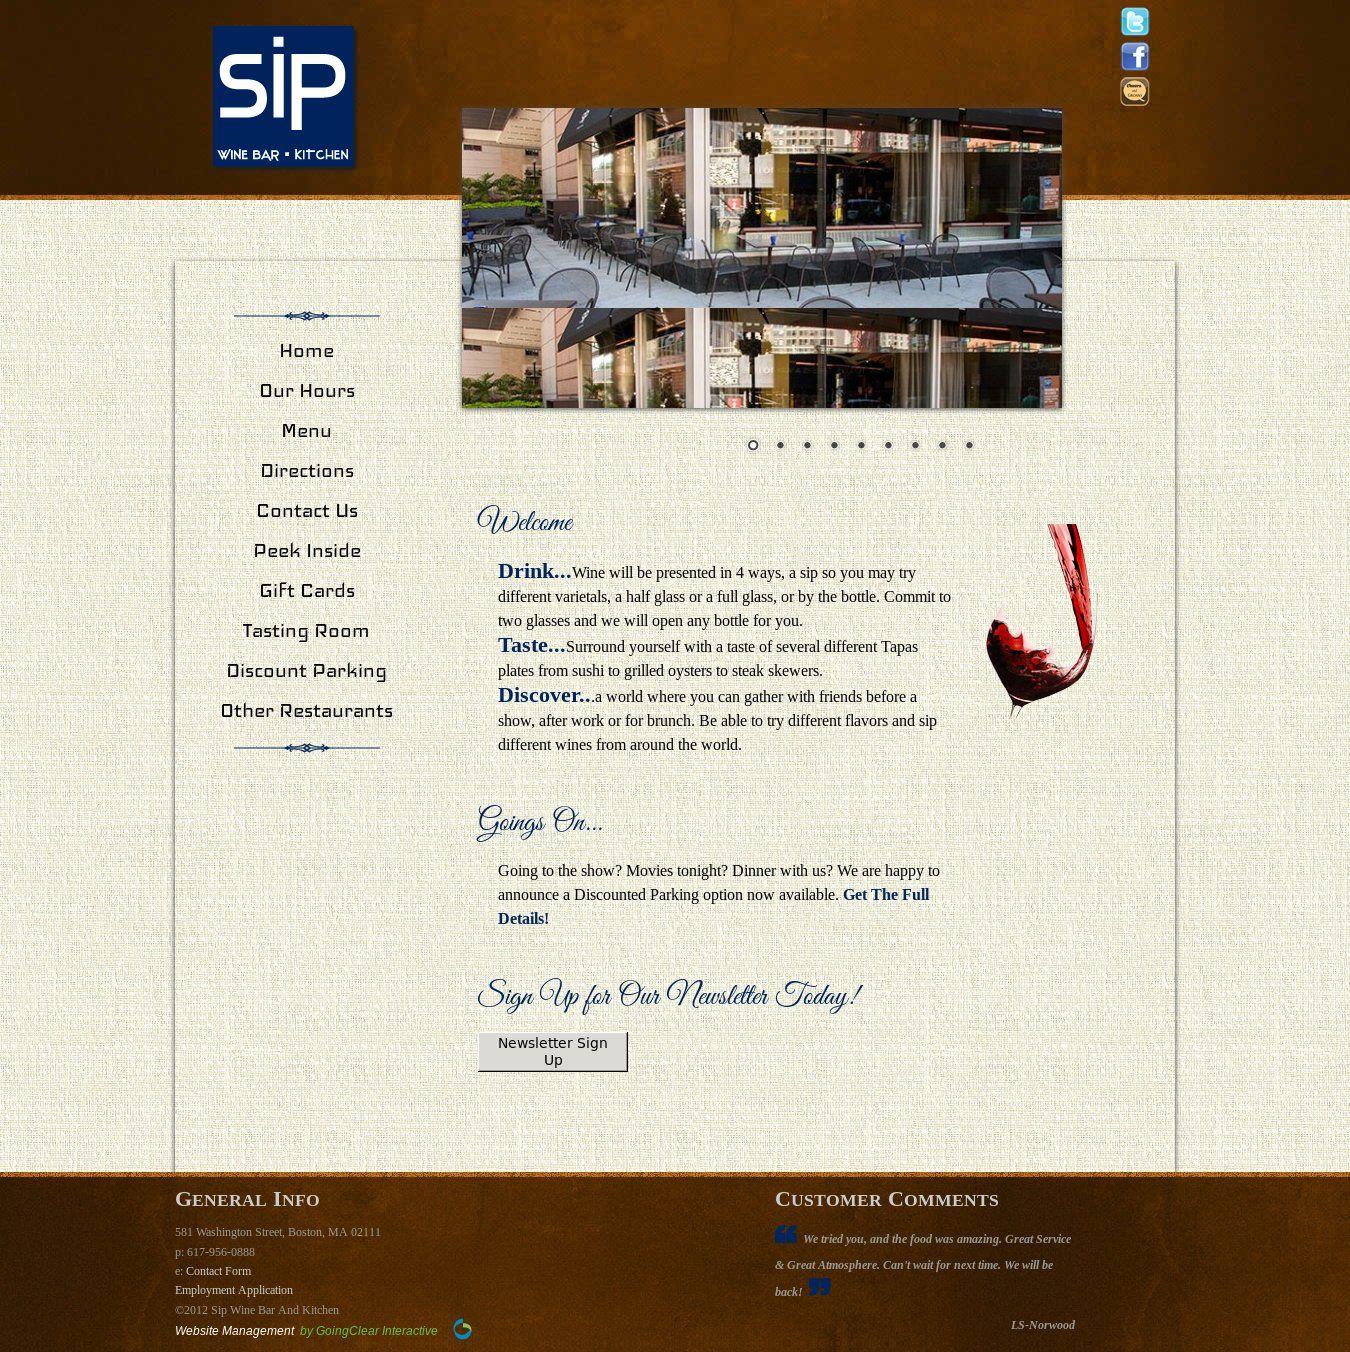 Wordpress Site Sipwinebarandkitchen Com Uses The Different Wines Tasting Room Wordpress Theme